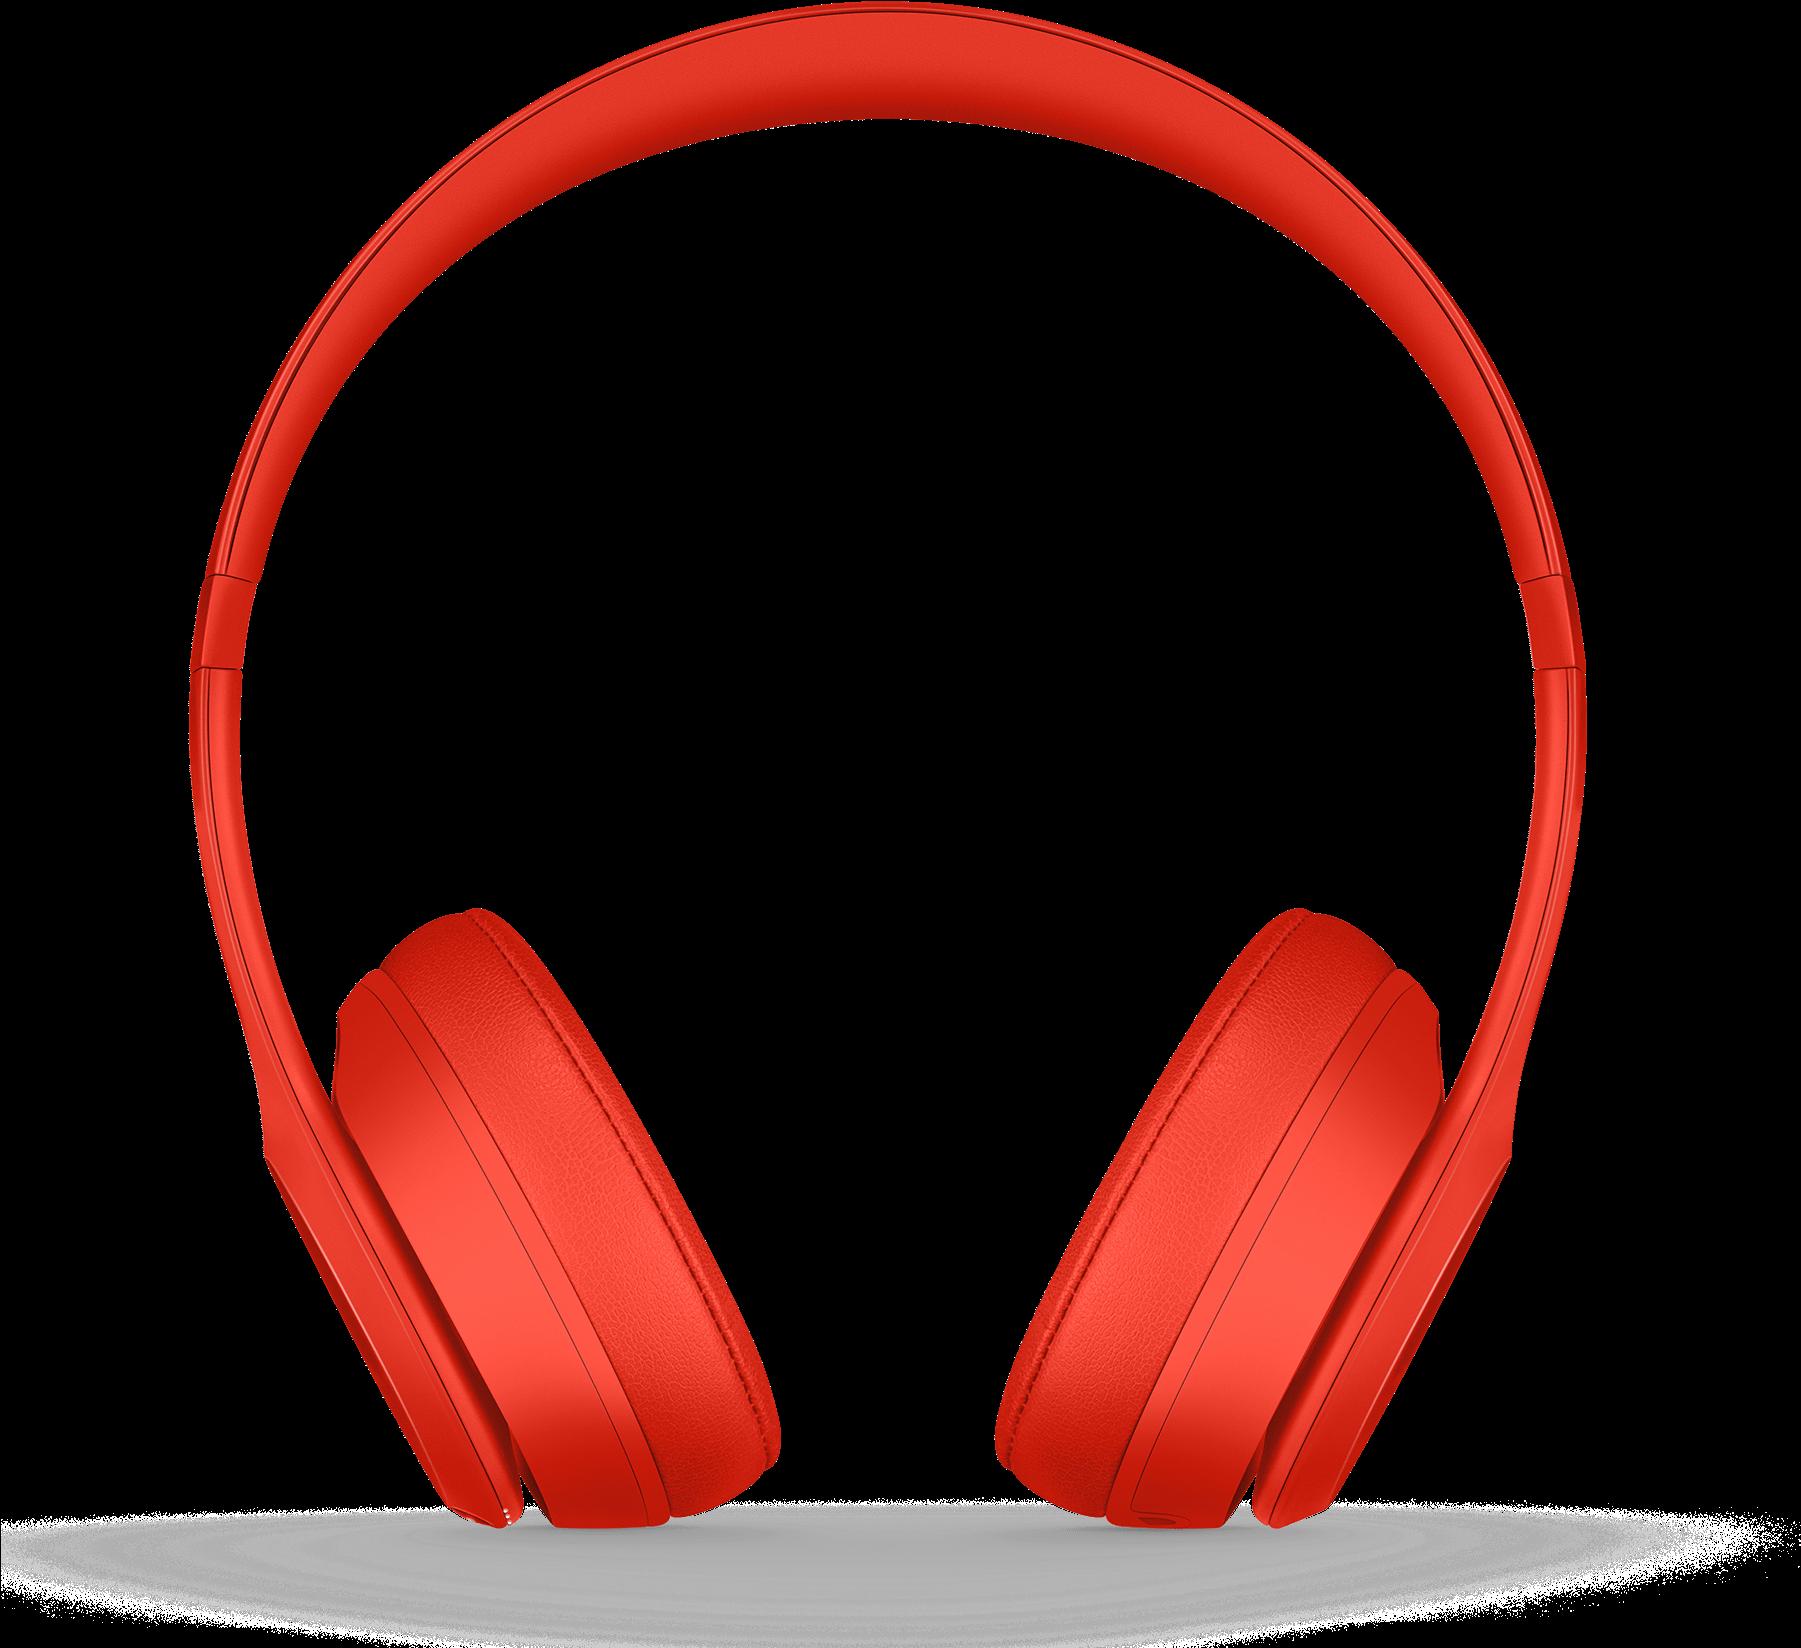 Transparent cartoon music solo. Headphone clipart headphone beats